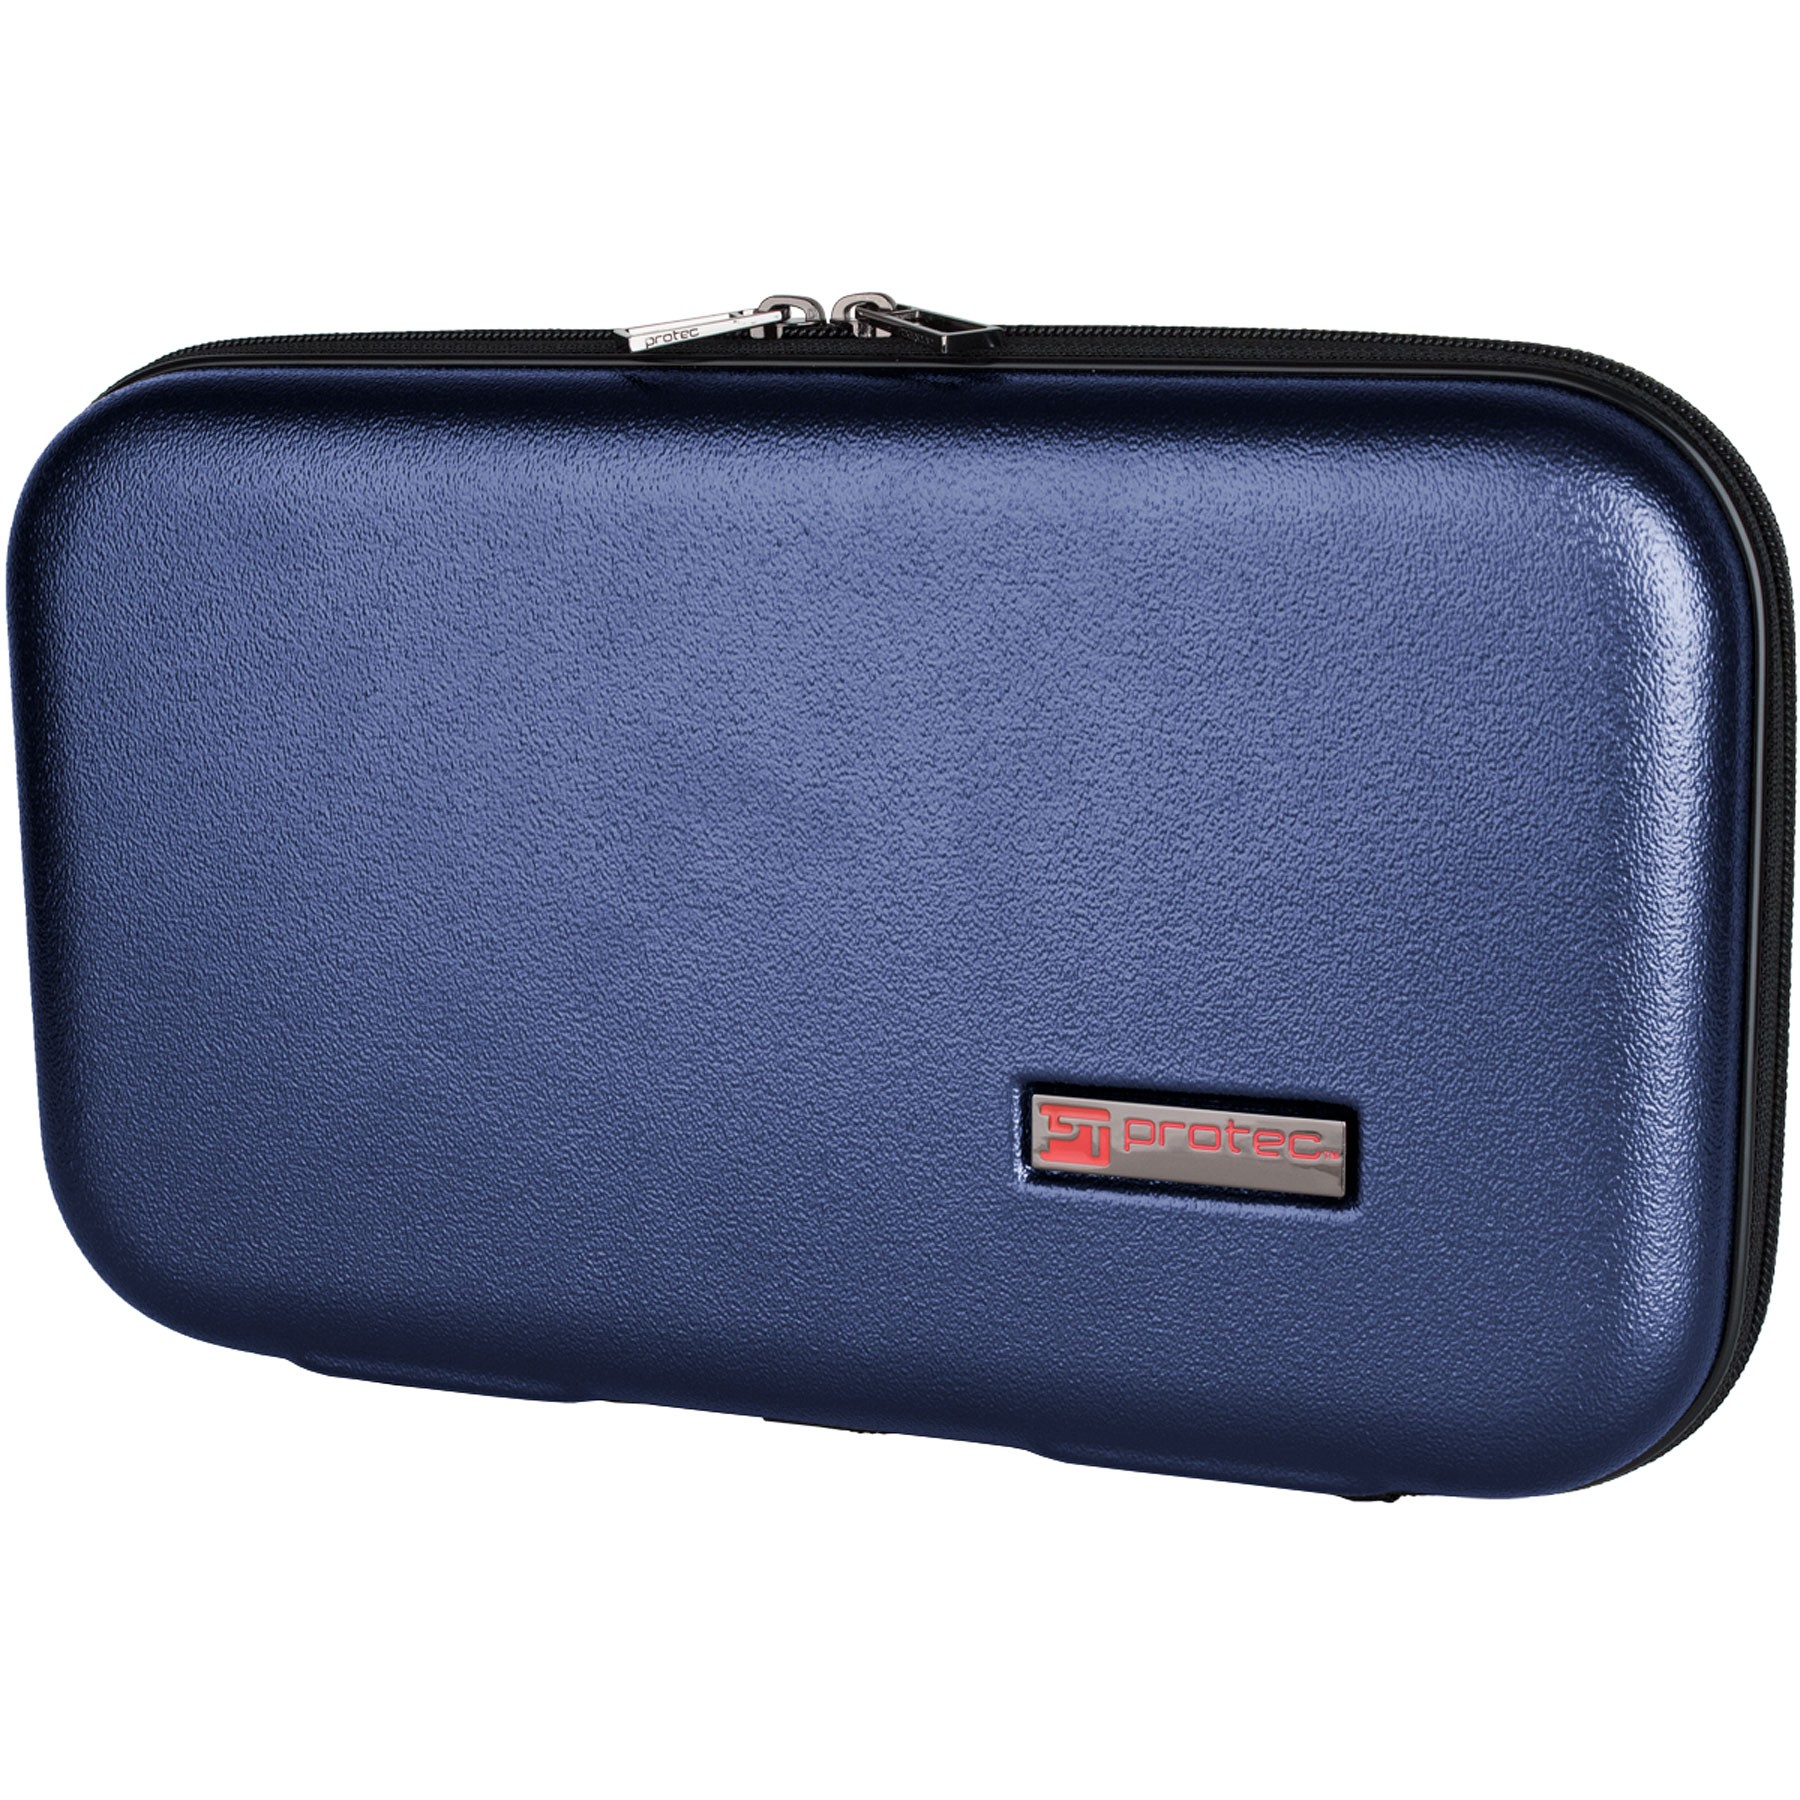 Protec Oboe Micro ZIP Case (Blue BM315BX)